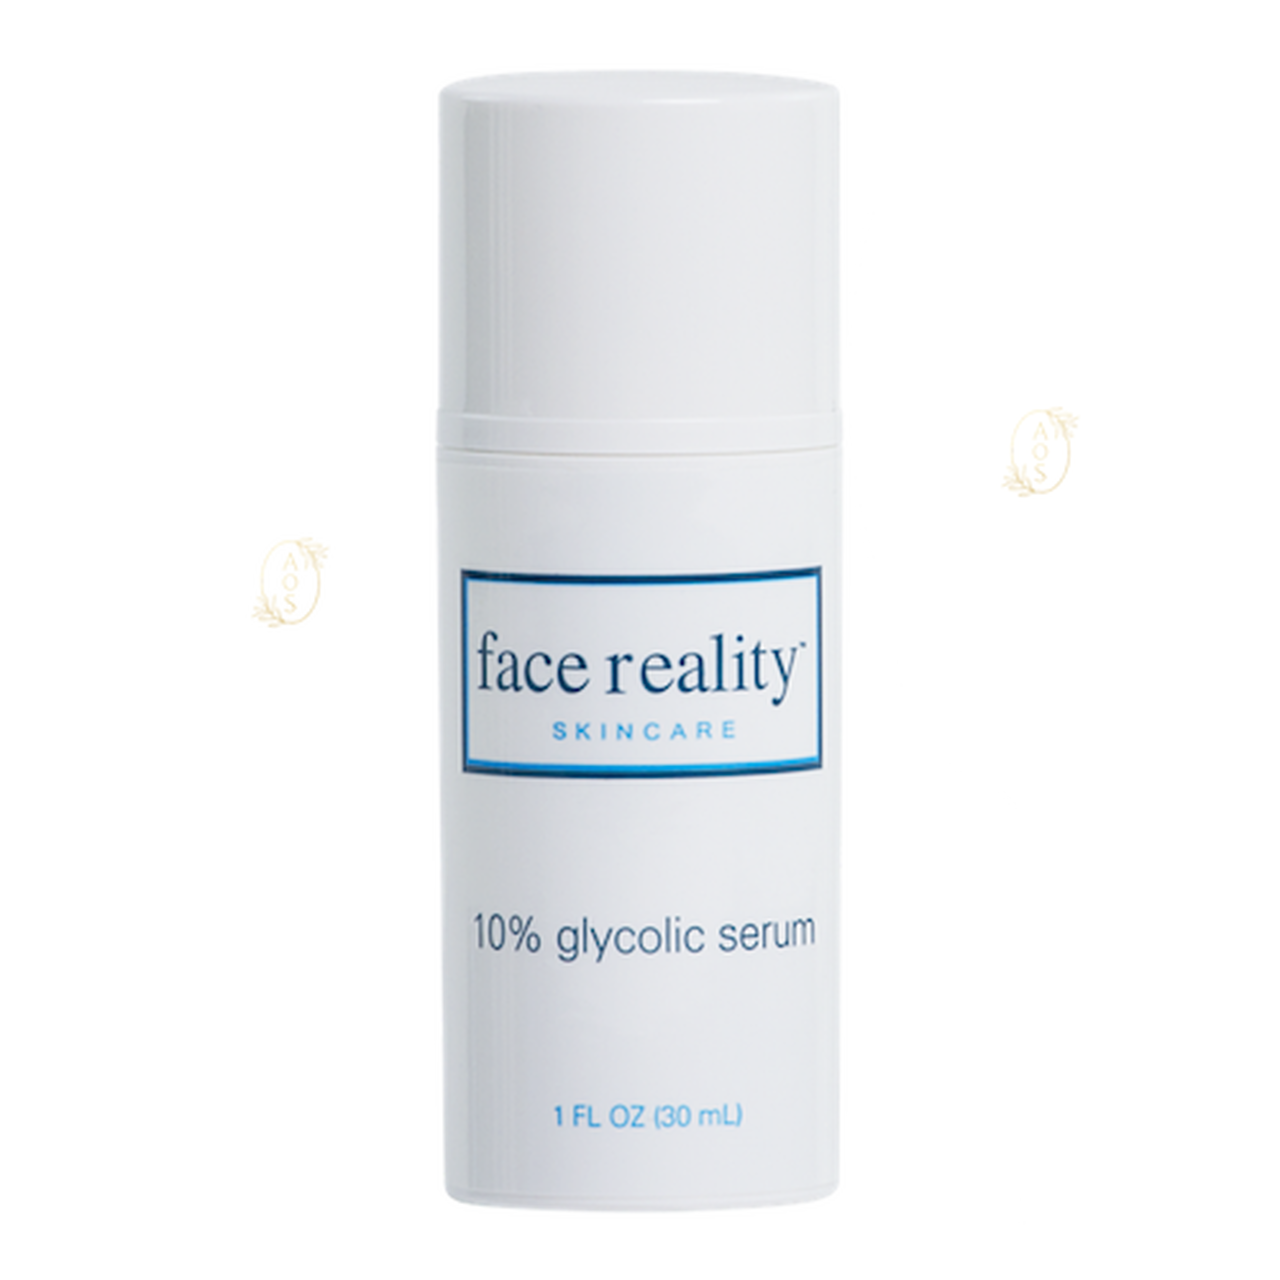 Face Reality 10% Glycolic Acid Serum